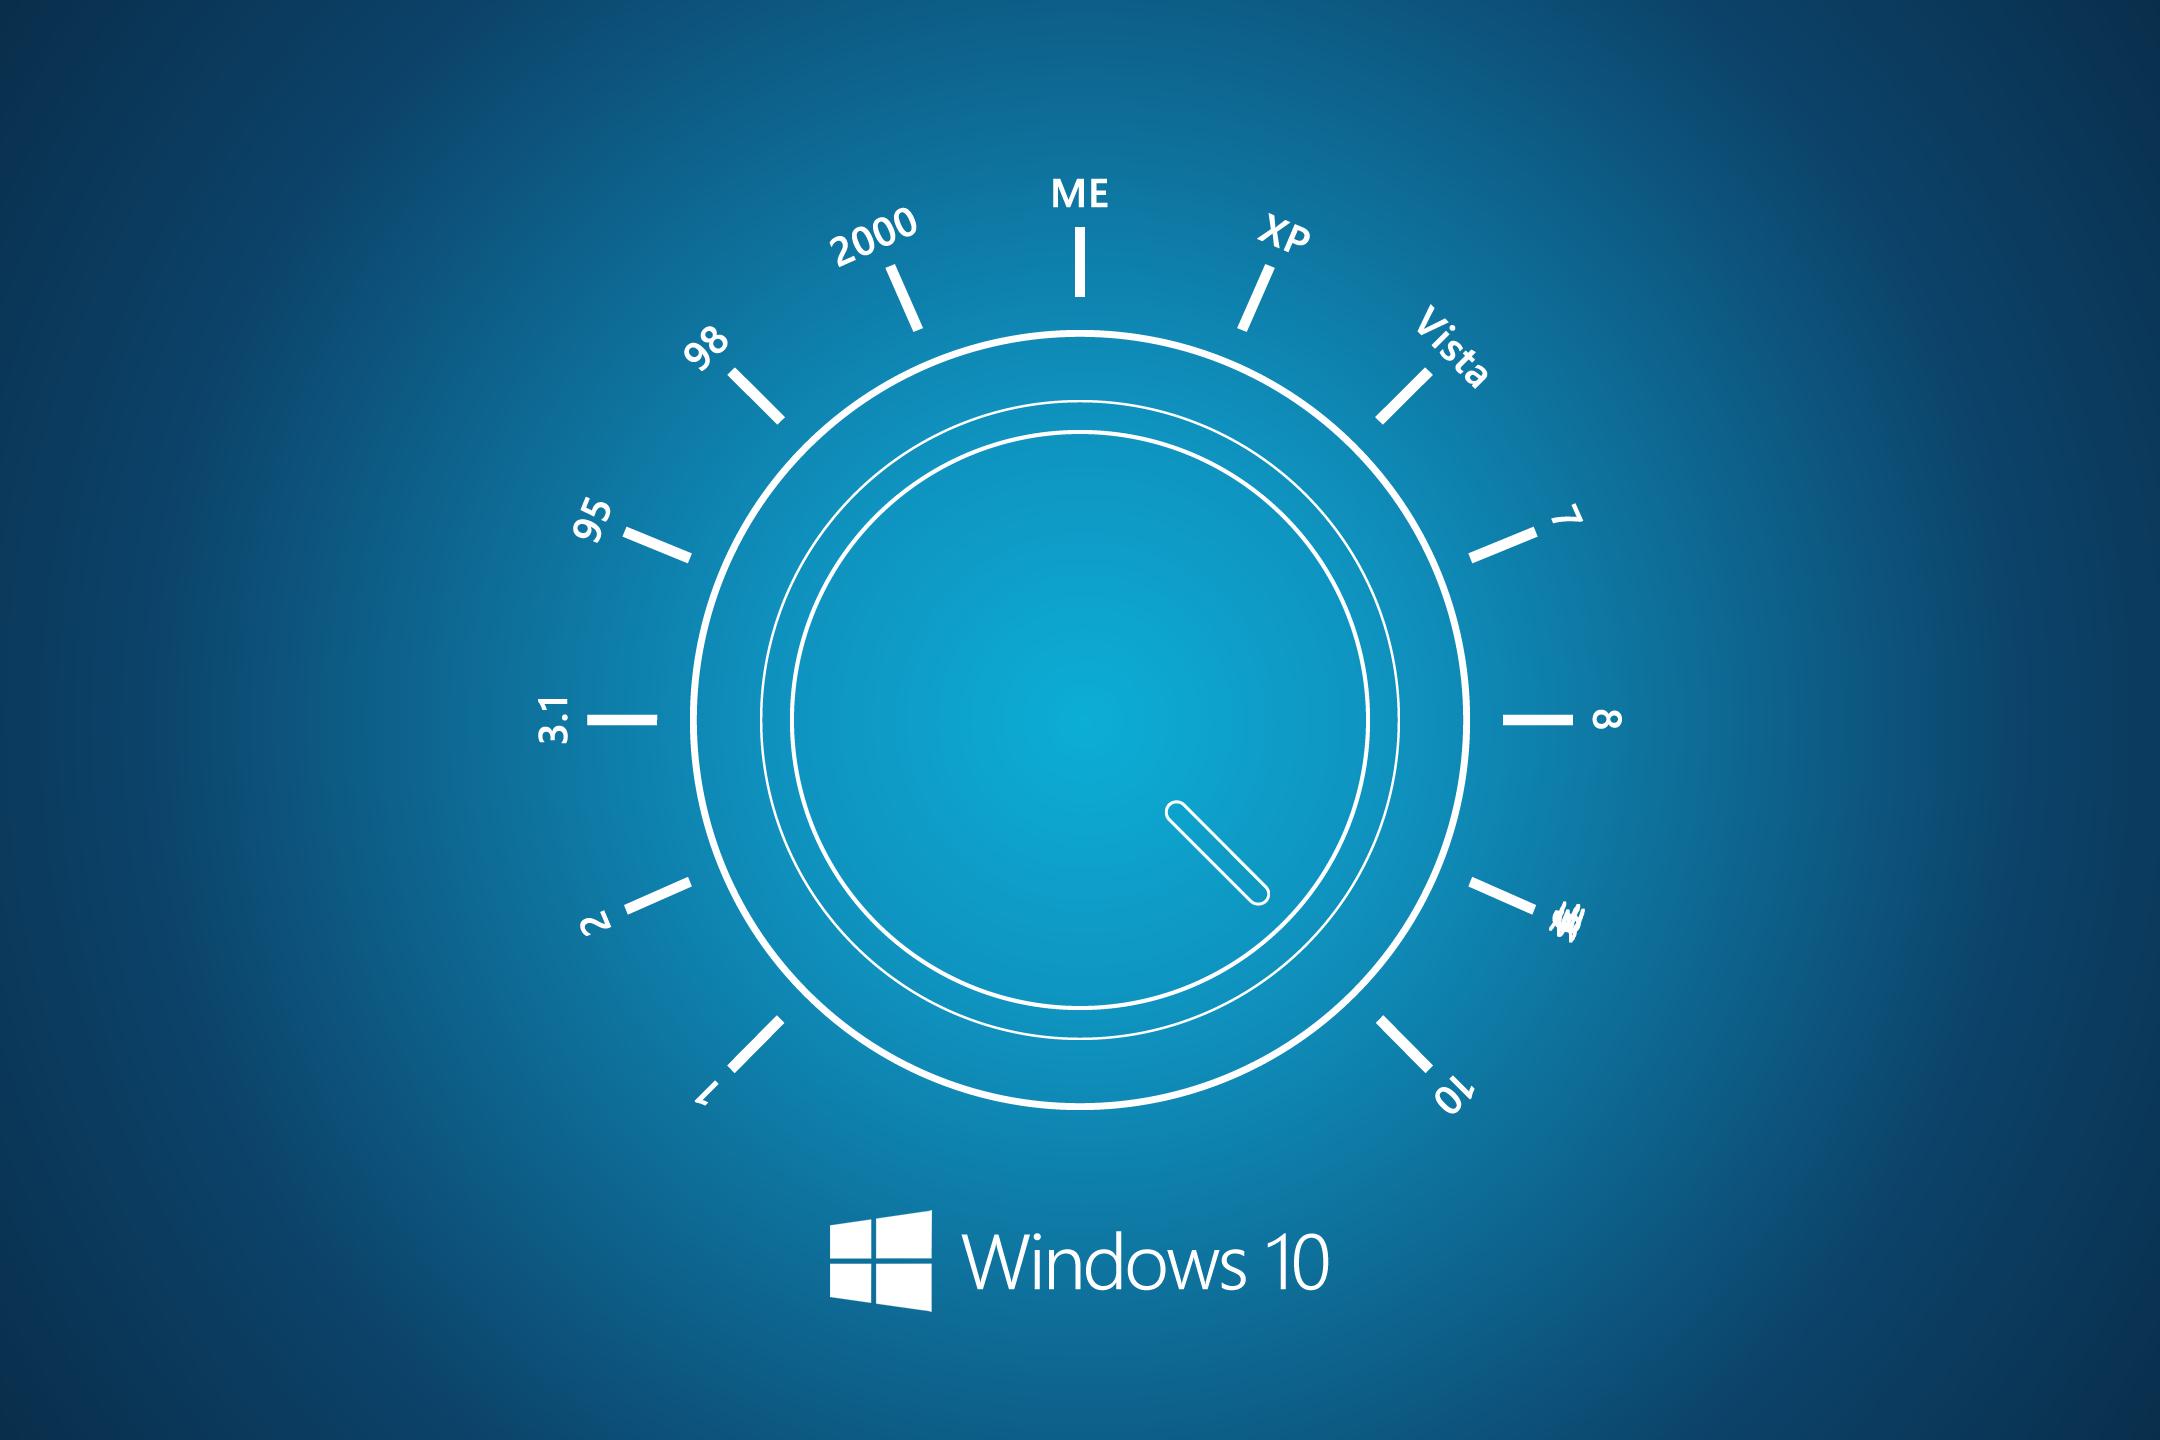 Windows 10 Speed Dial Wallpaper by MichaelGillett   Piptell 2160x1440